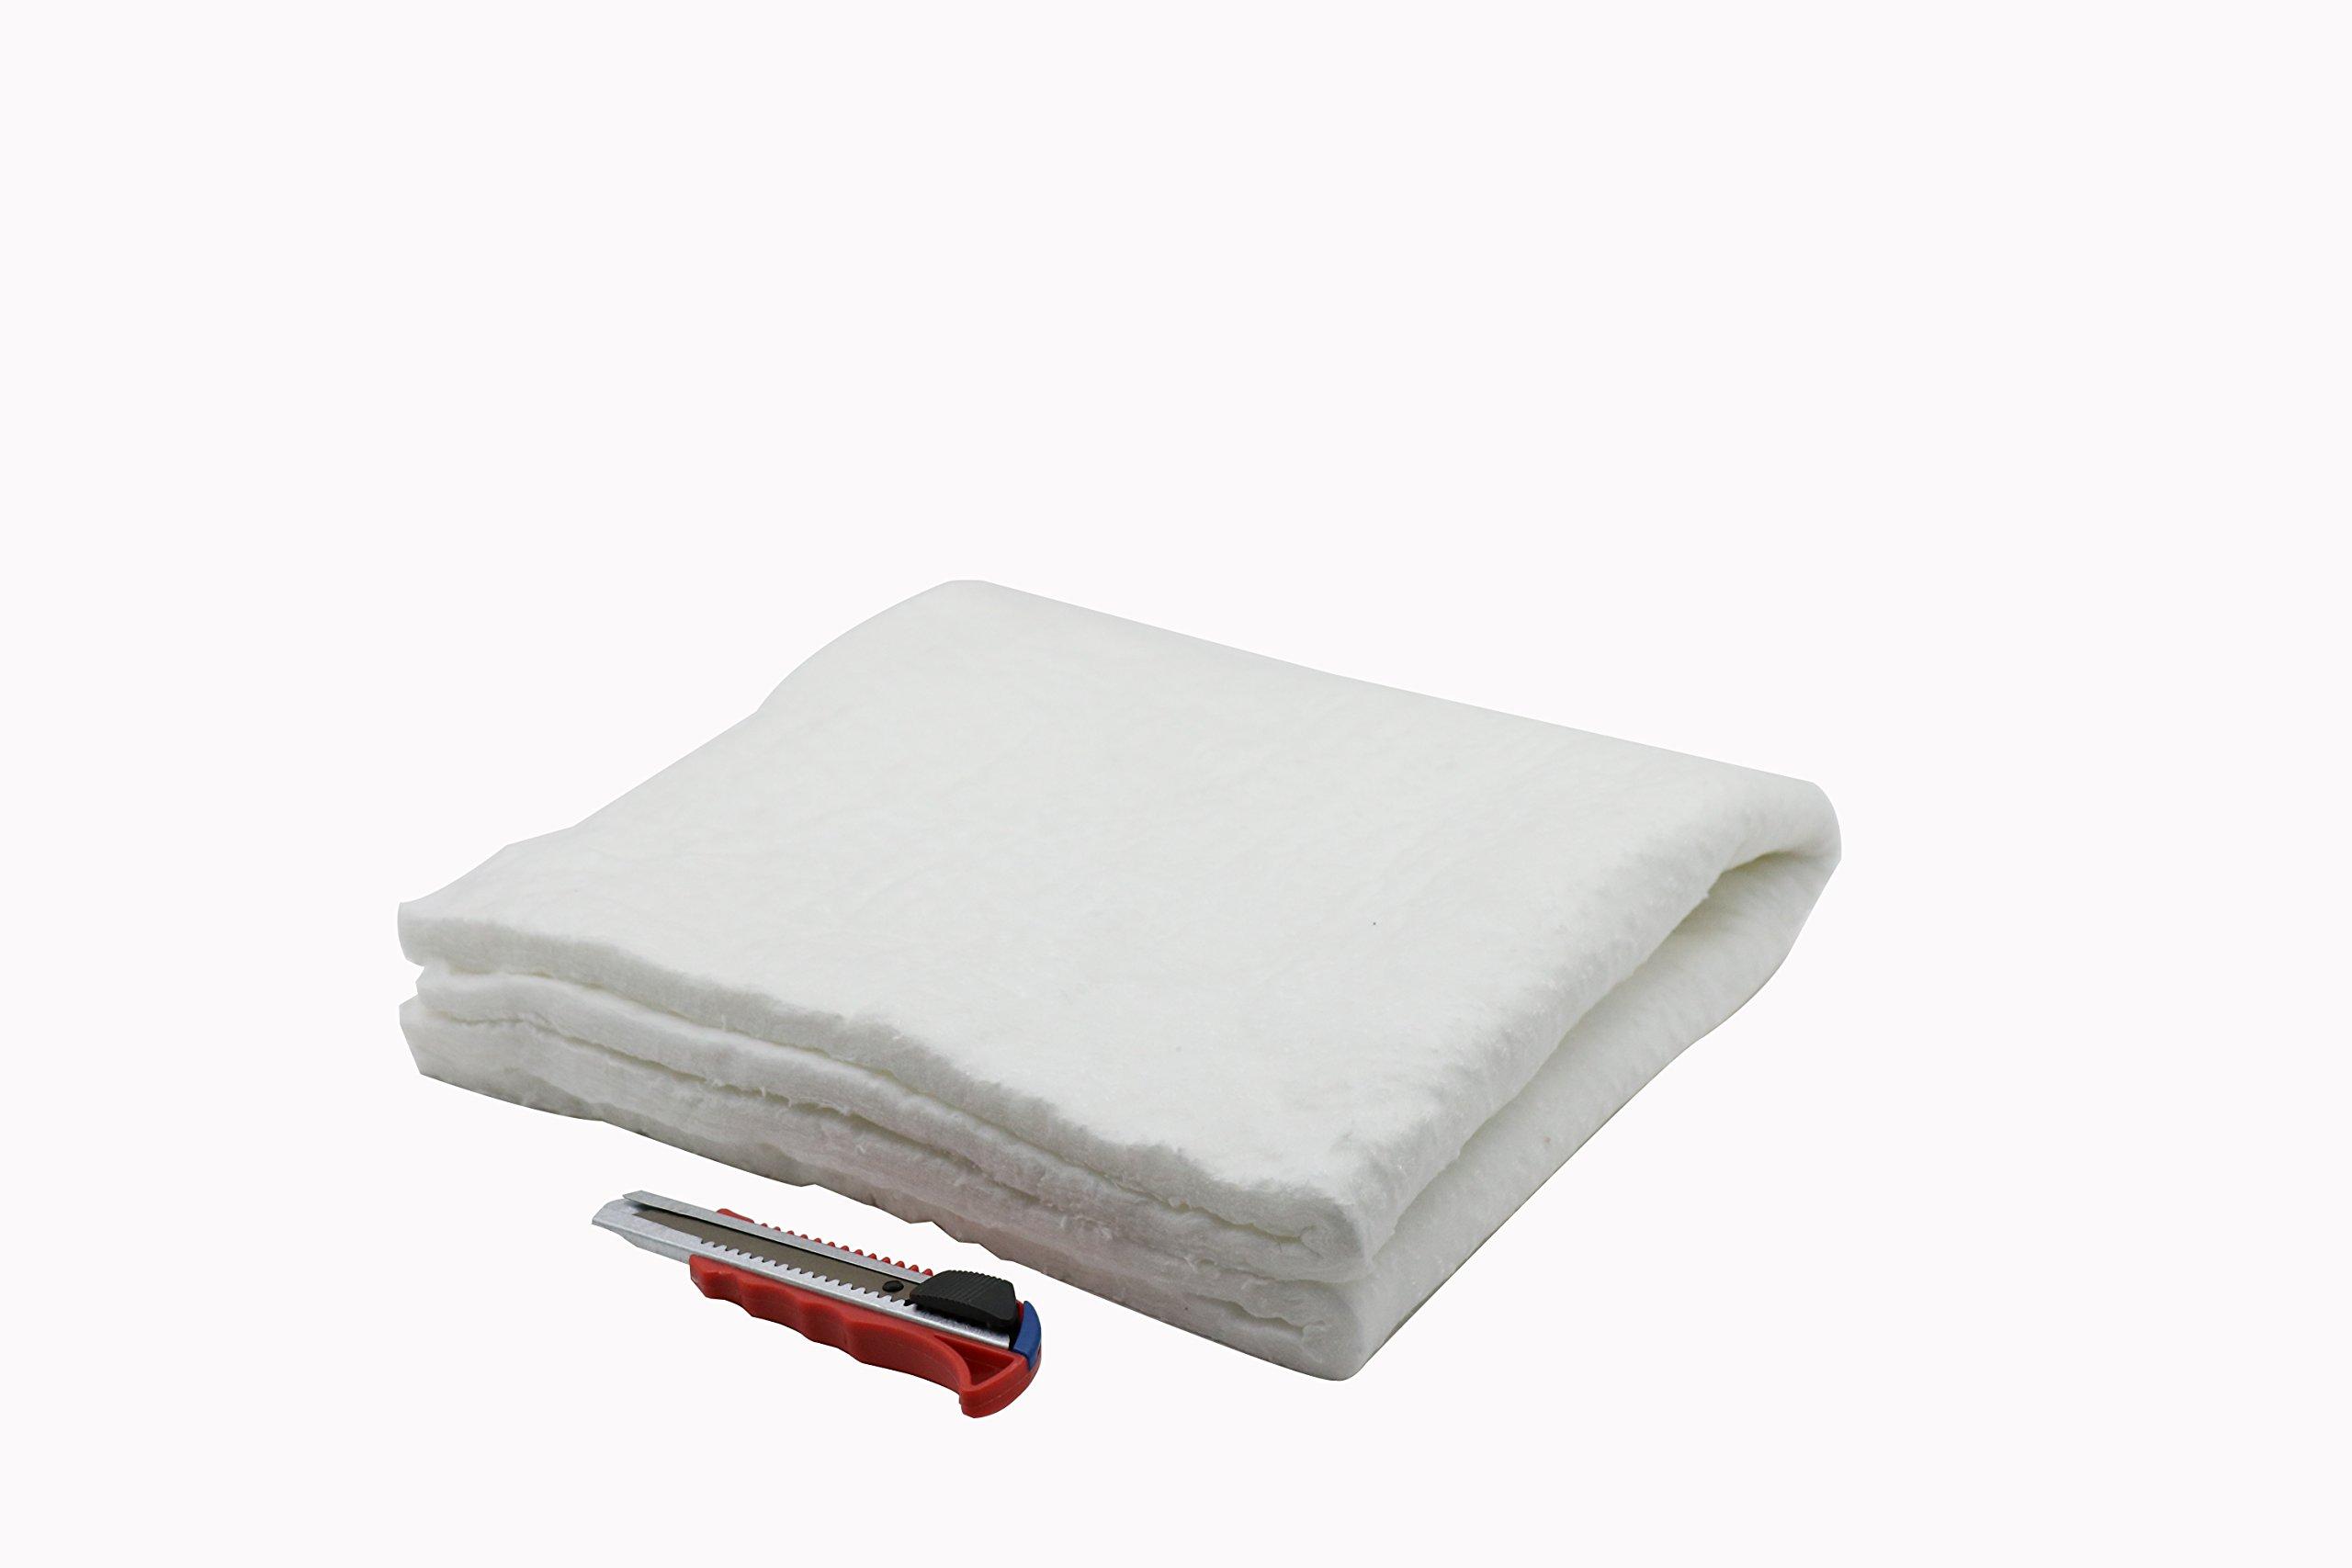 HM&FC 1/2''24''24'' Ceramic Fiber Insulation Blanket 2400F for QuadraFire Wood Stoves, & More. by HMFC